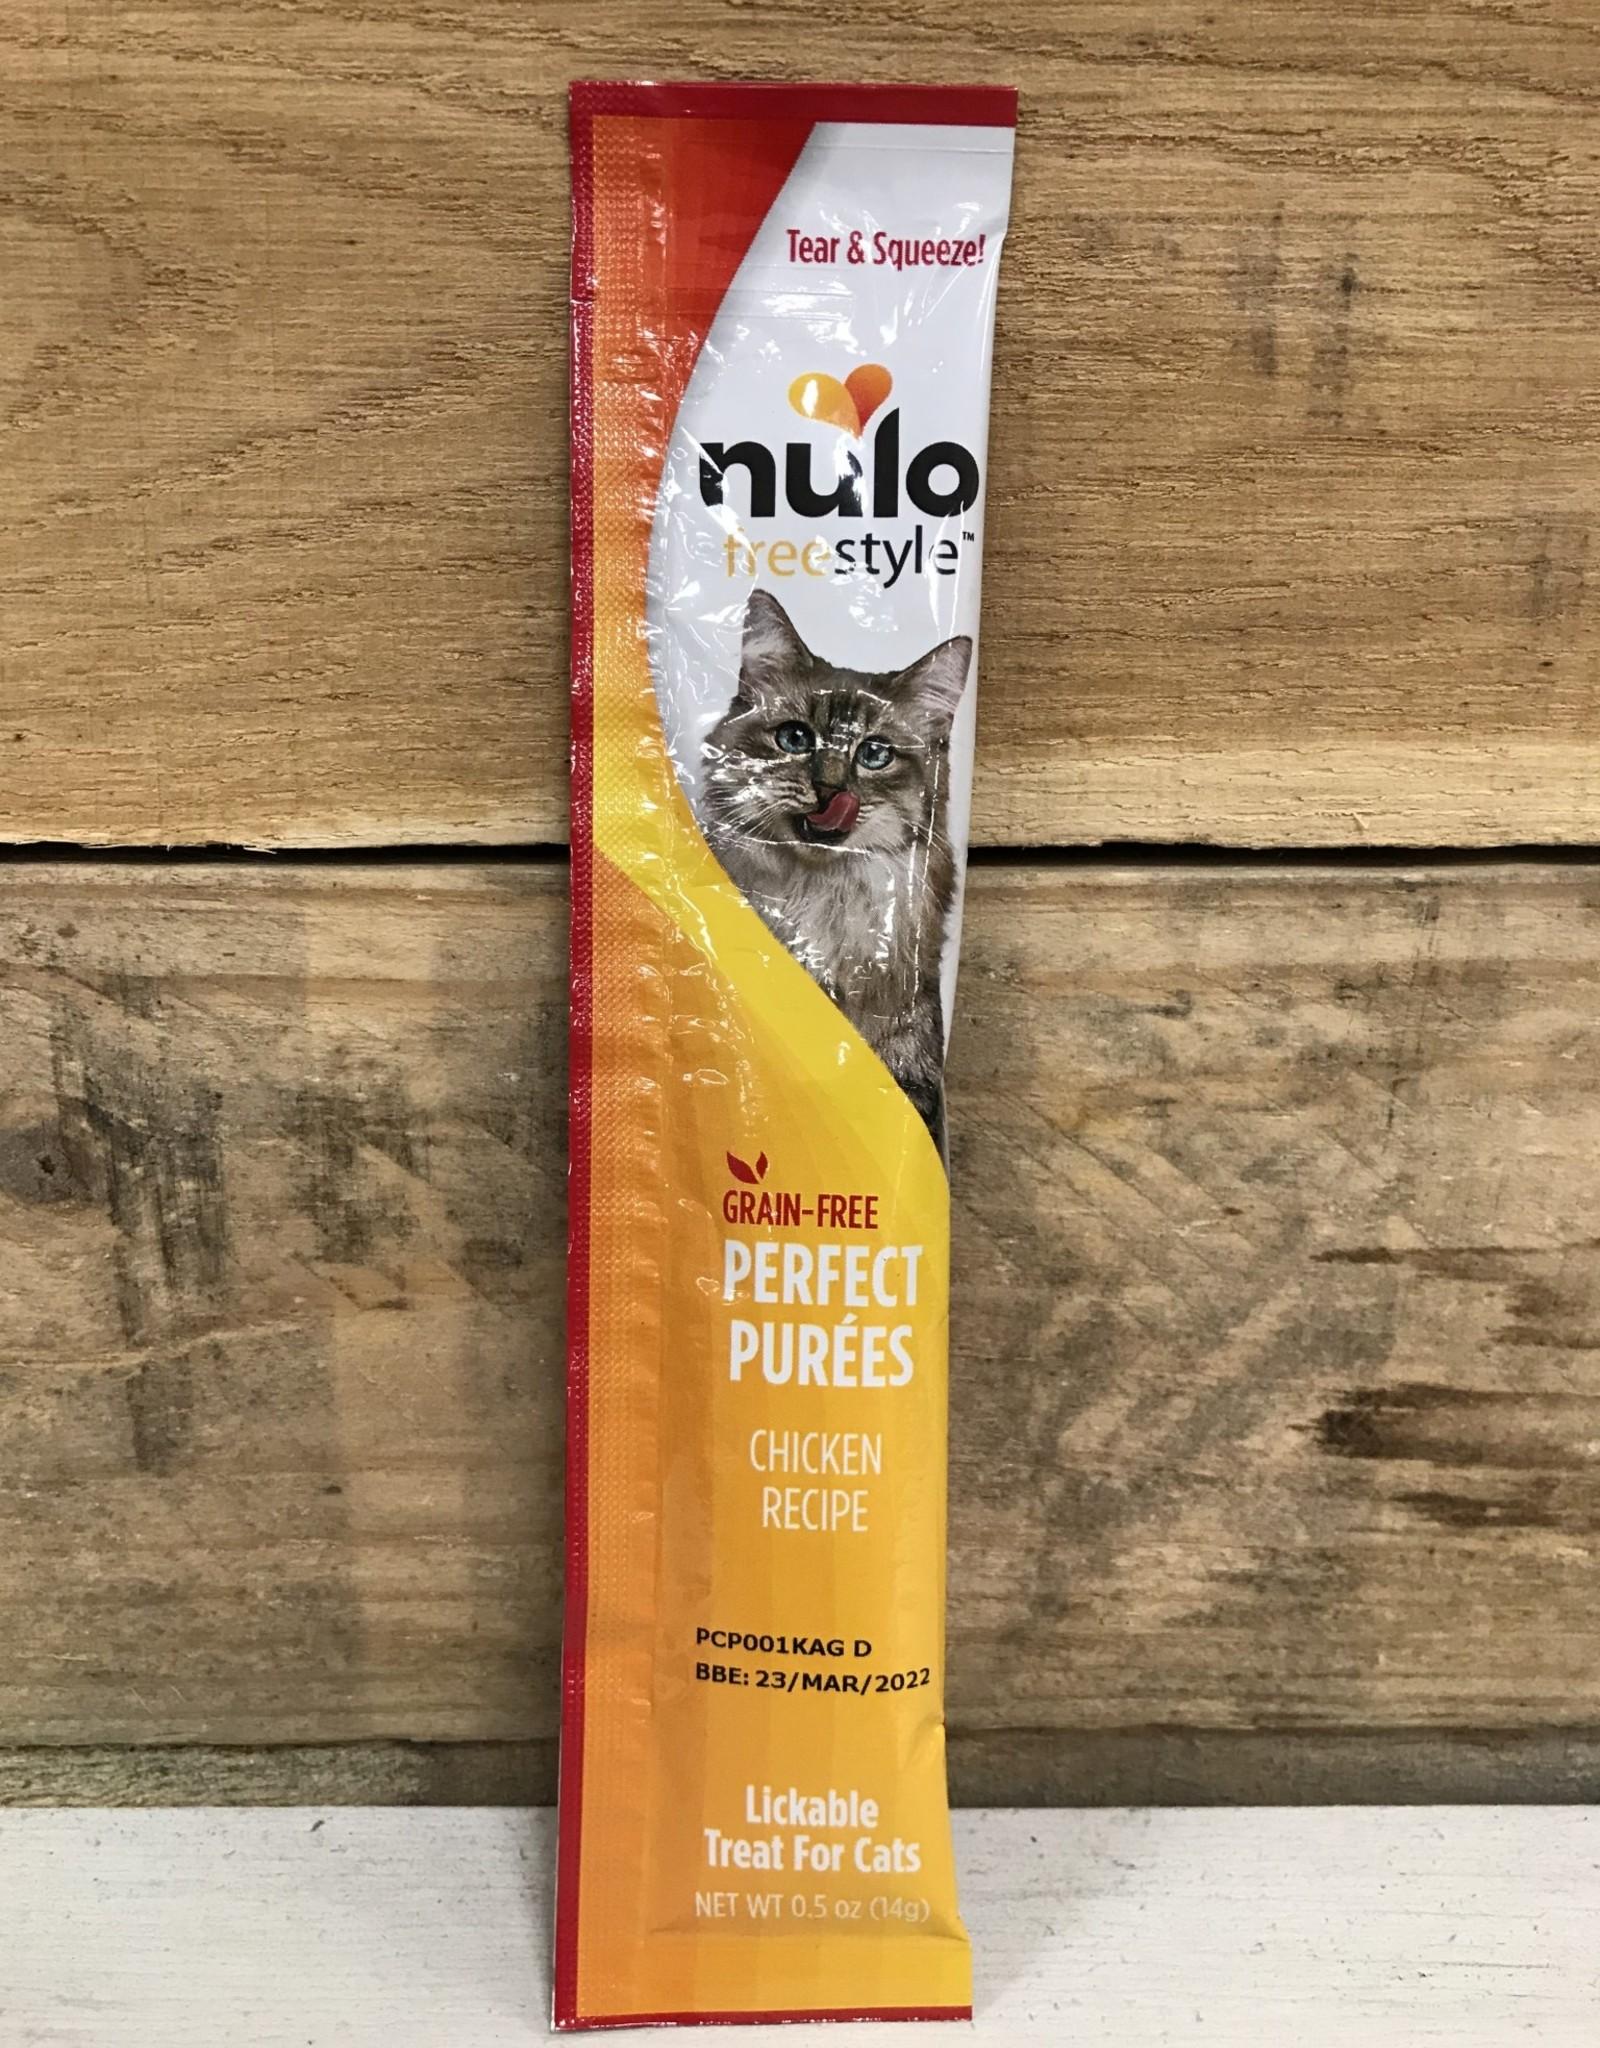 Nulo Nulo FreeStyle 5oz Grain Free Cat Chicken Puree Sachet treat